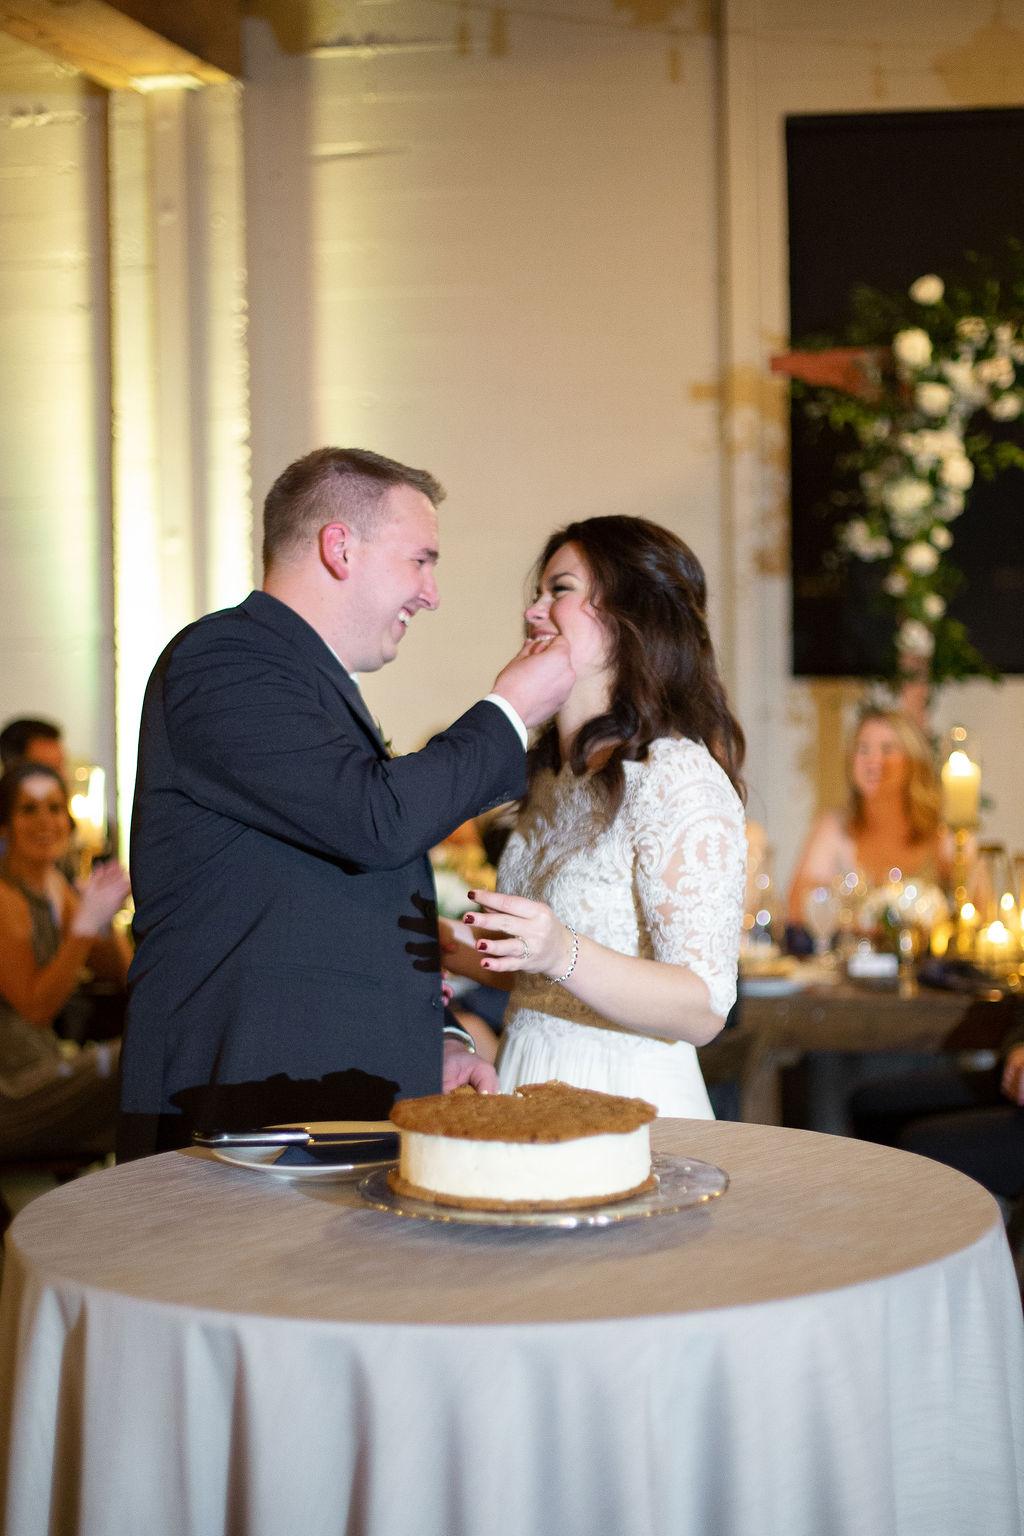 045_reception_portland,oregon,castaway,wedding,by_outlive_creative,photo,and,video.jpg